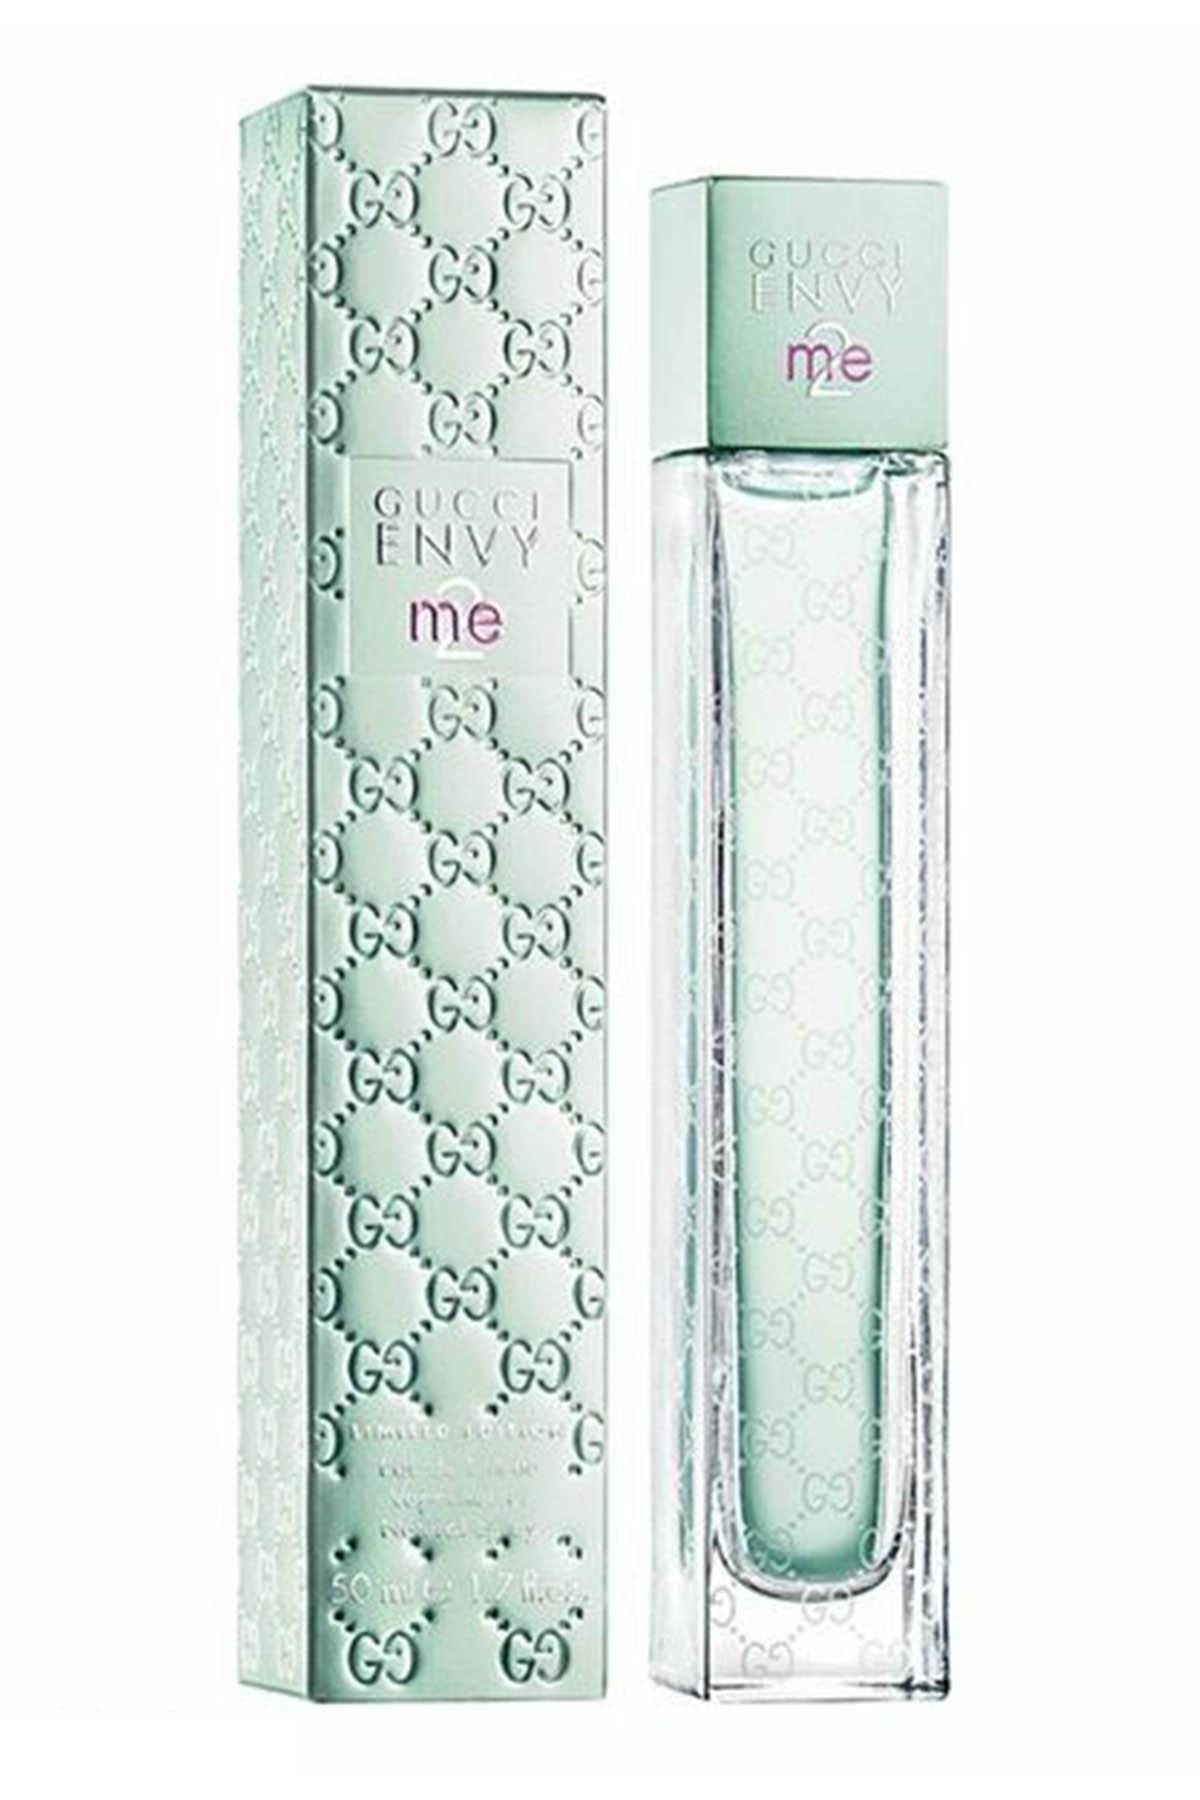 Gucci Envy Me 2 Limited Edition EDT 50 ml Kadın Parfüm